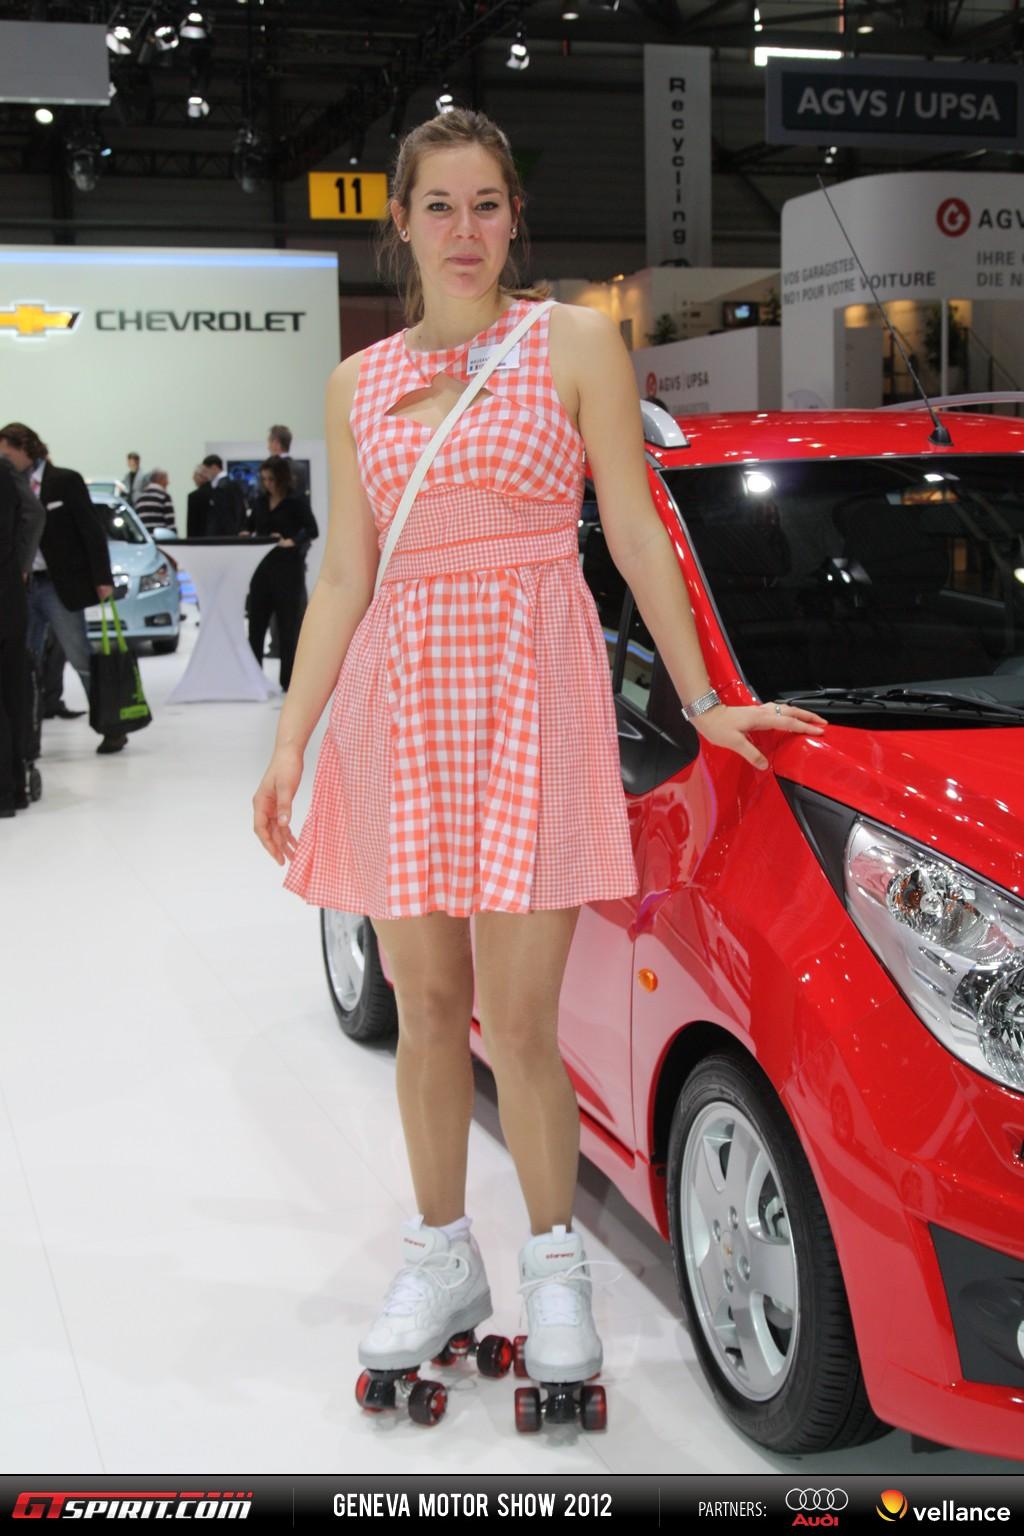 Geneva Motor Show 2012 Girls Part 2 005